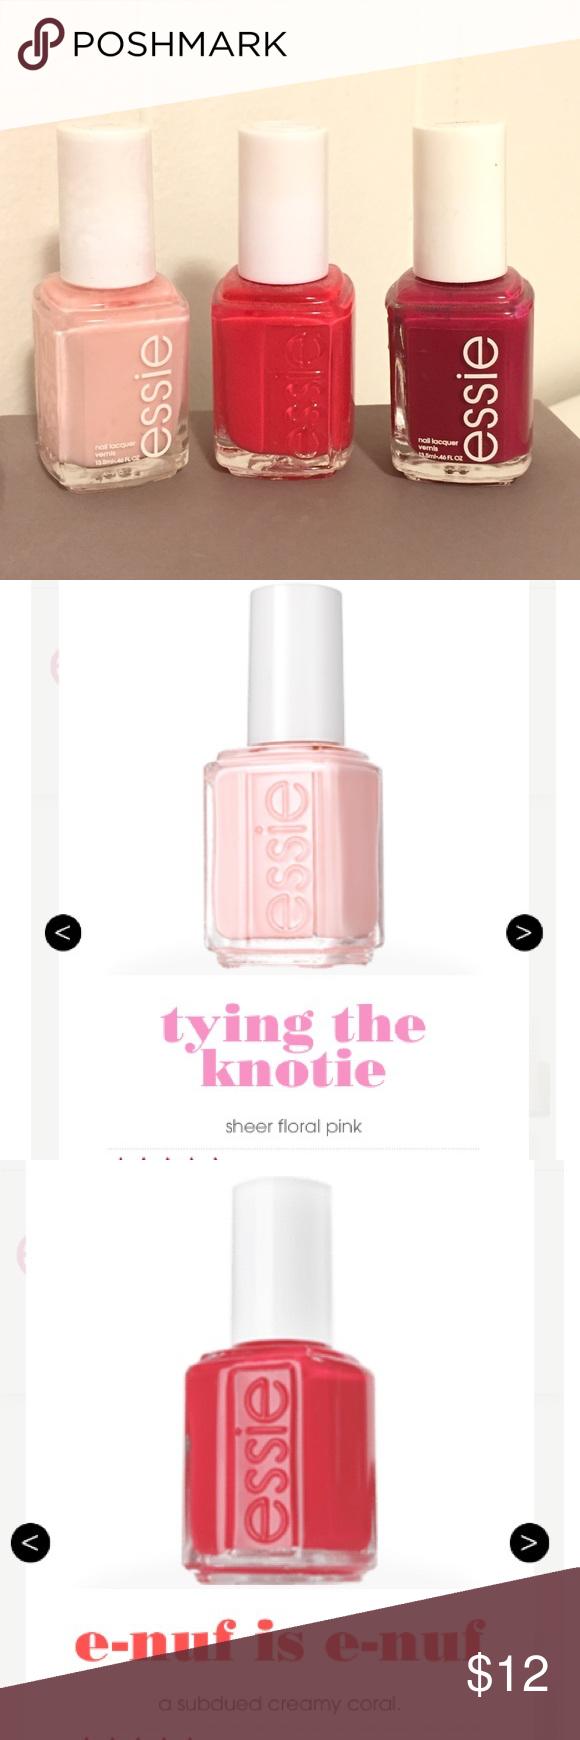 Brand new set of 3 Essie nail polishes Brand new 3 different Essie ...